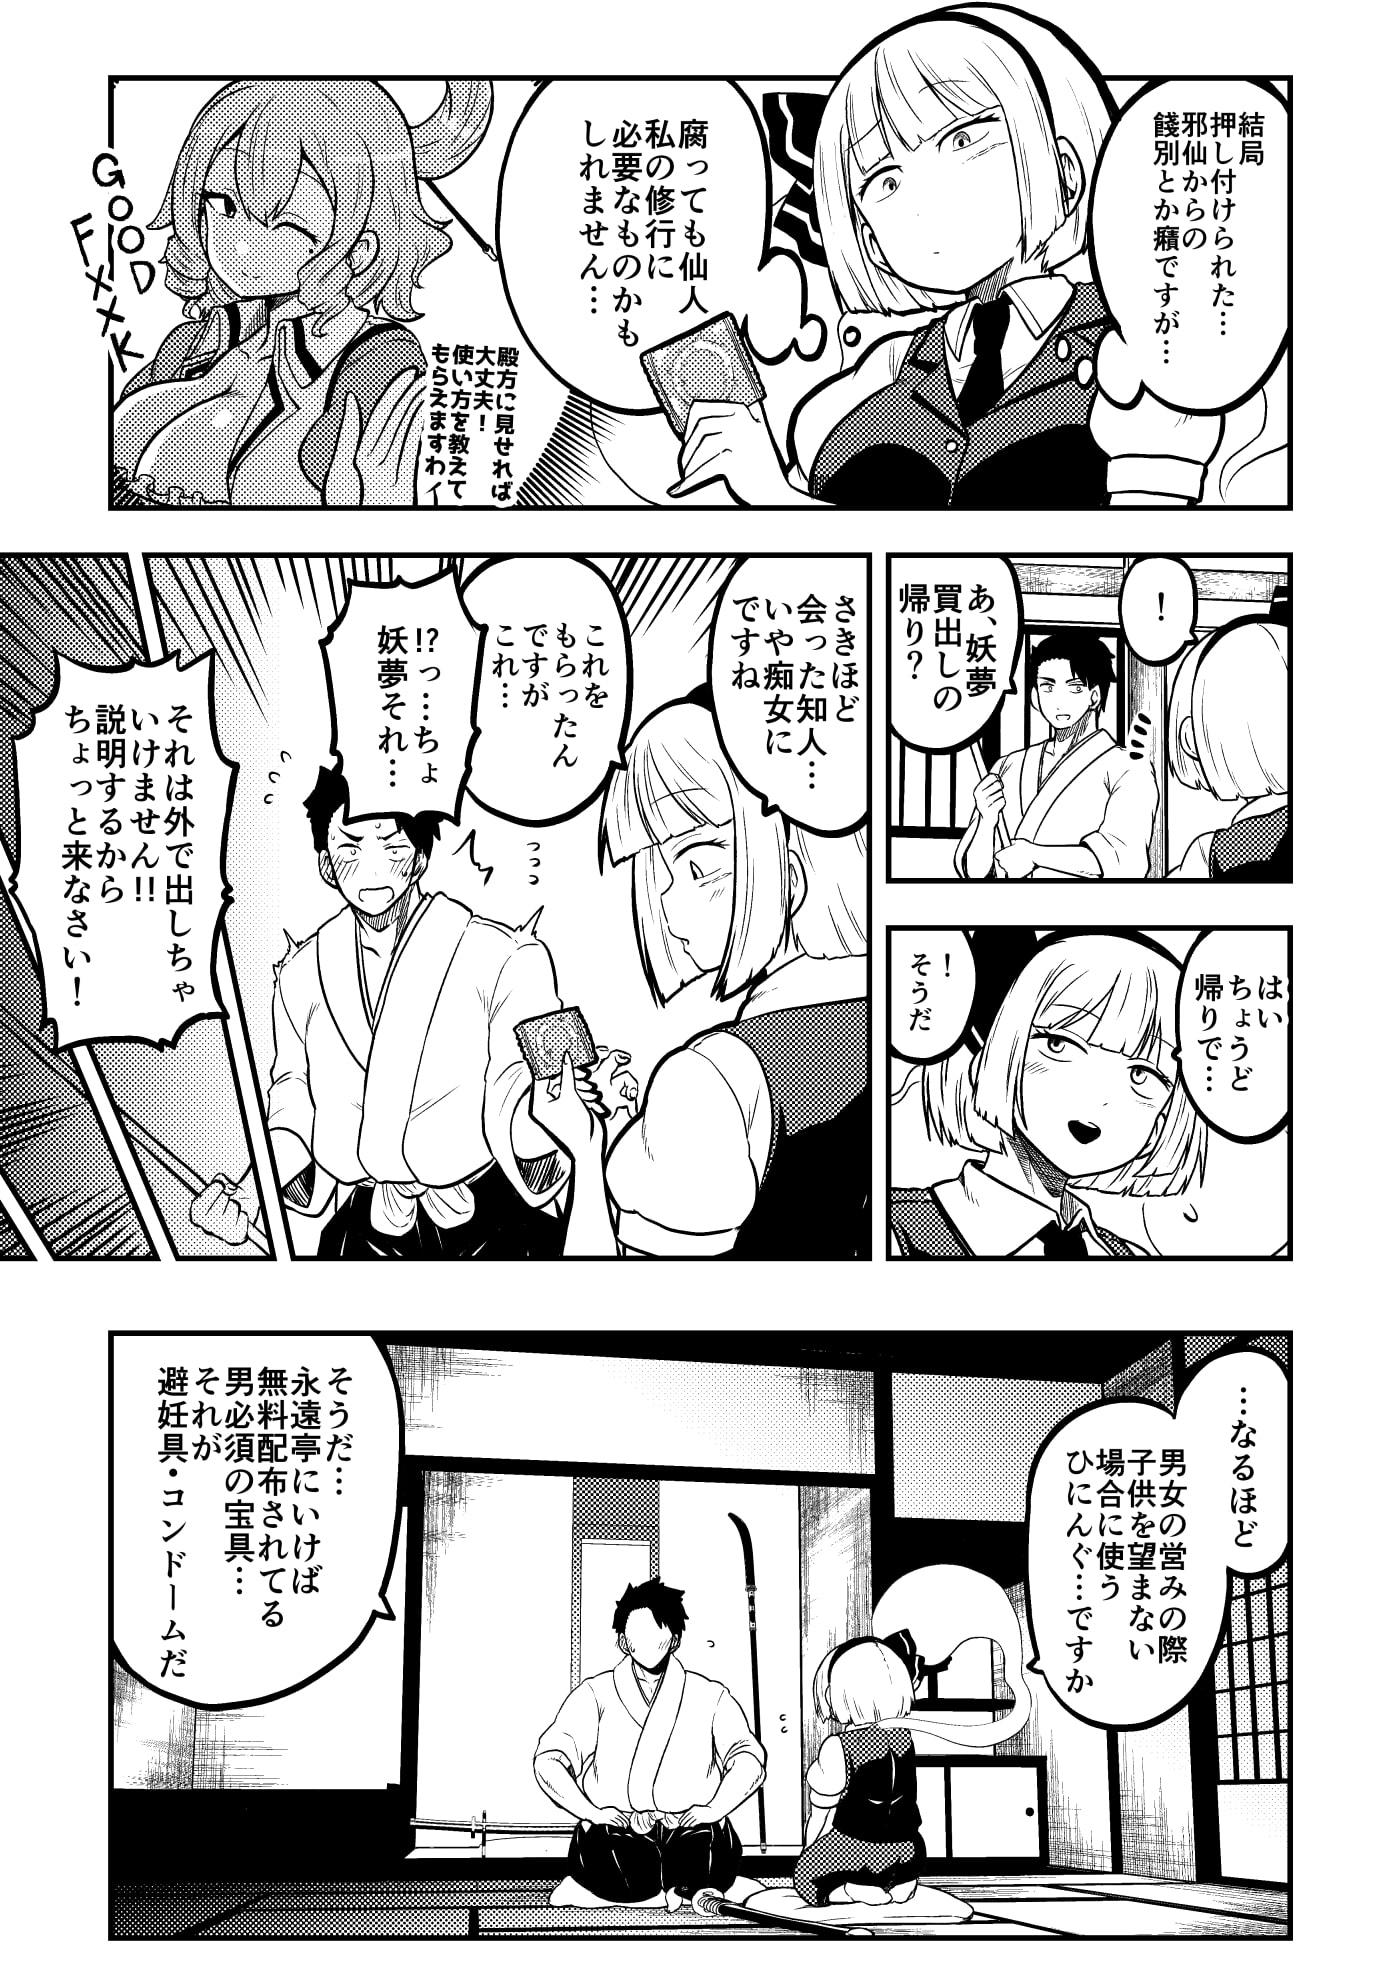 RJ324896 skebな幻想少女集2 [20210512]